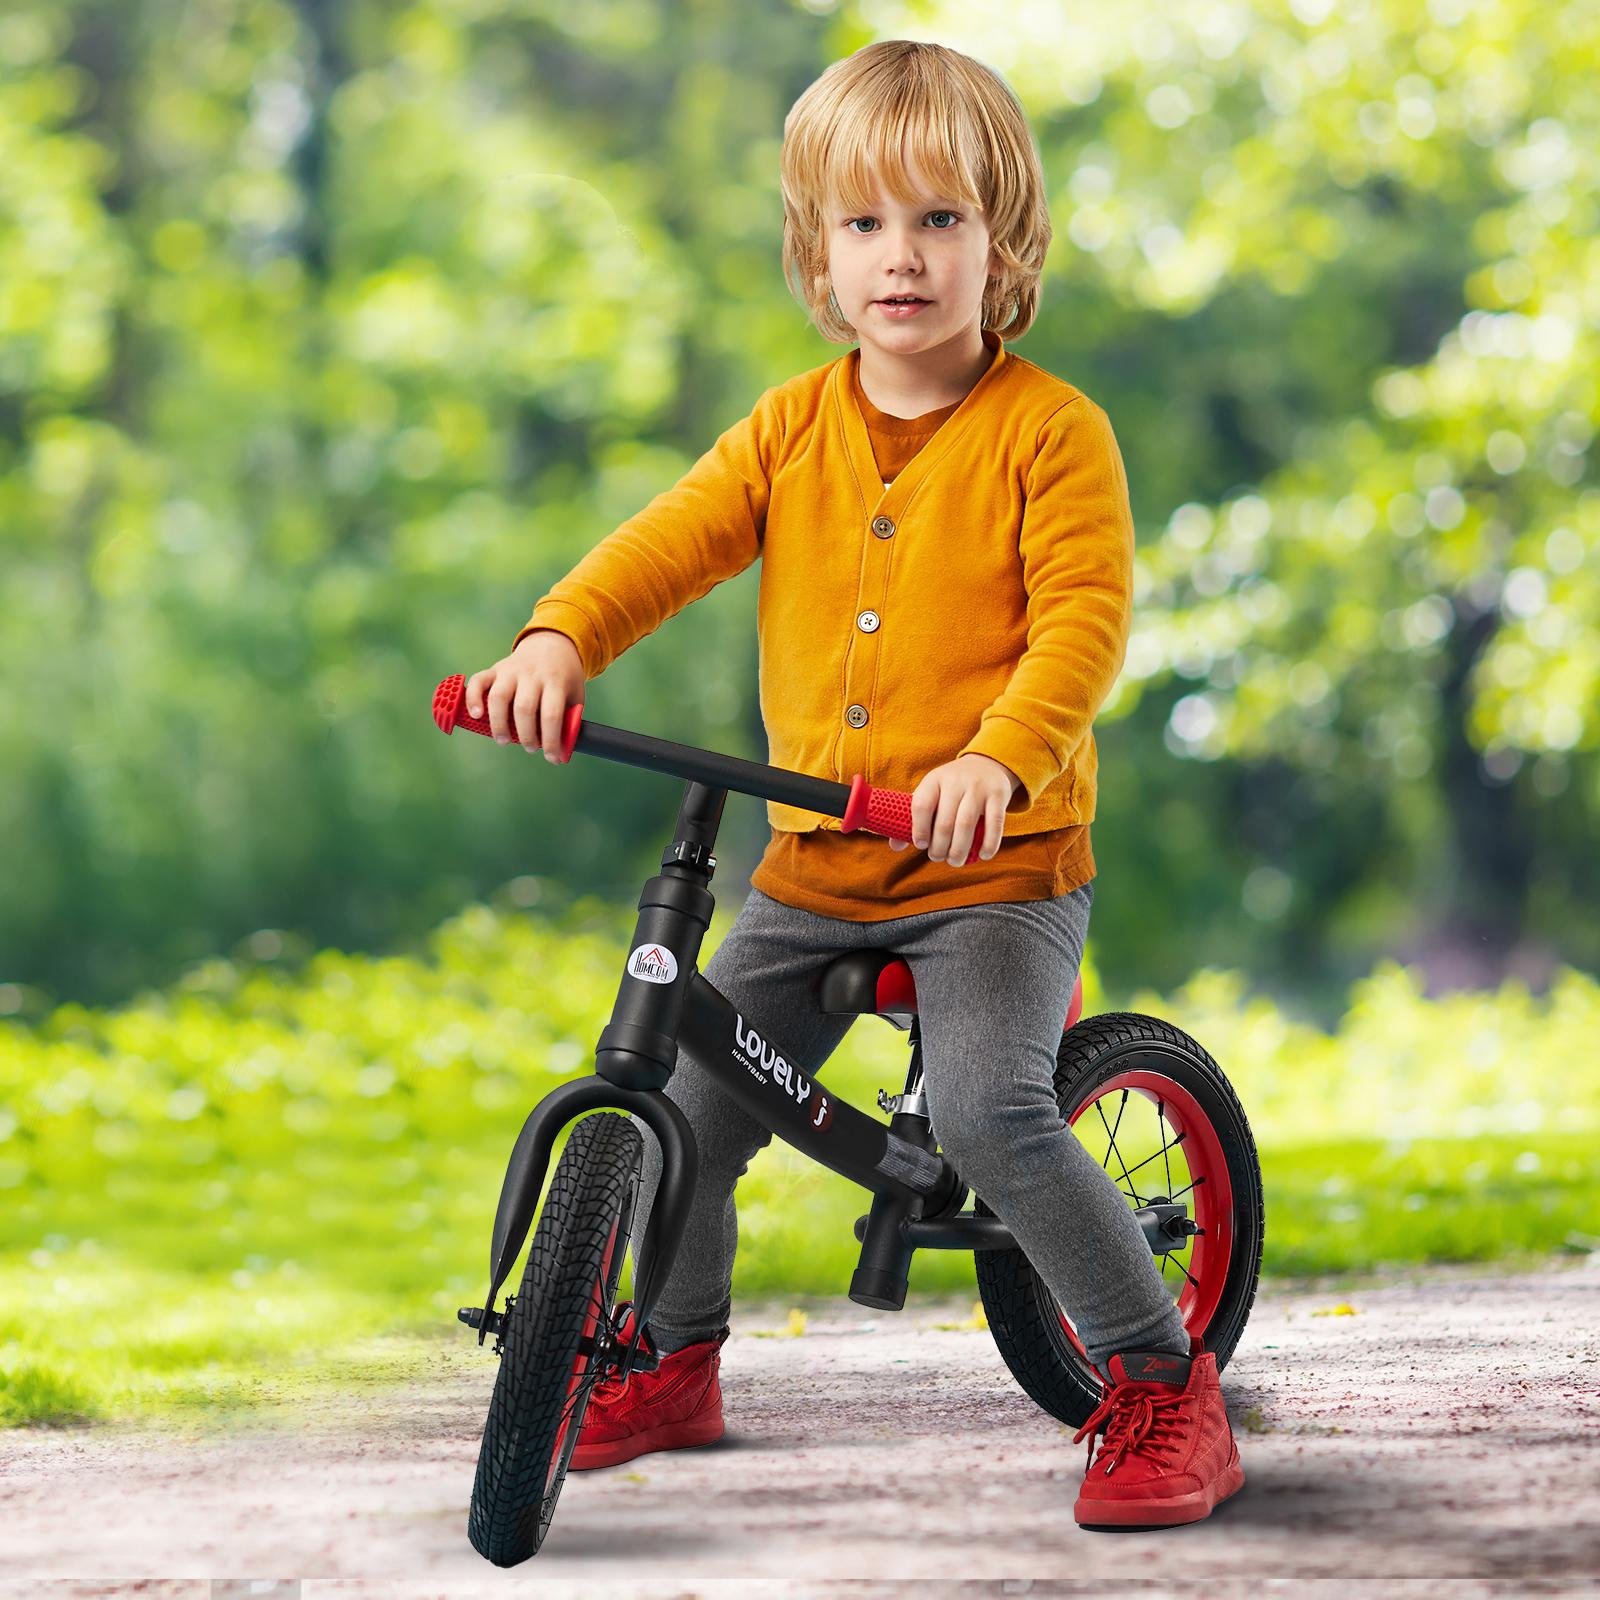 Bicicleta-sin-Pedales-de-Altura-de-Asiento-Regulable-31-45cm-2-5-Anos miniatura 13